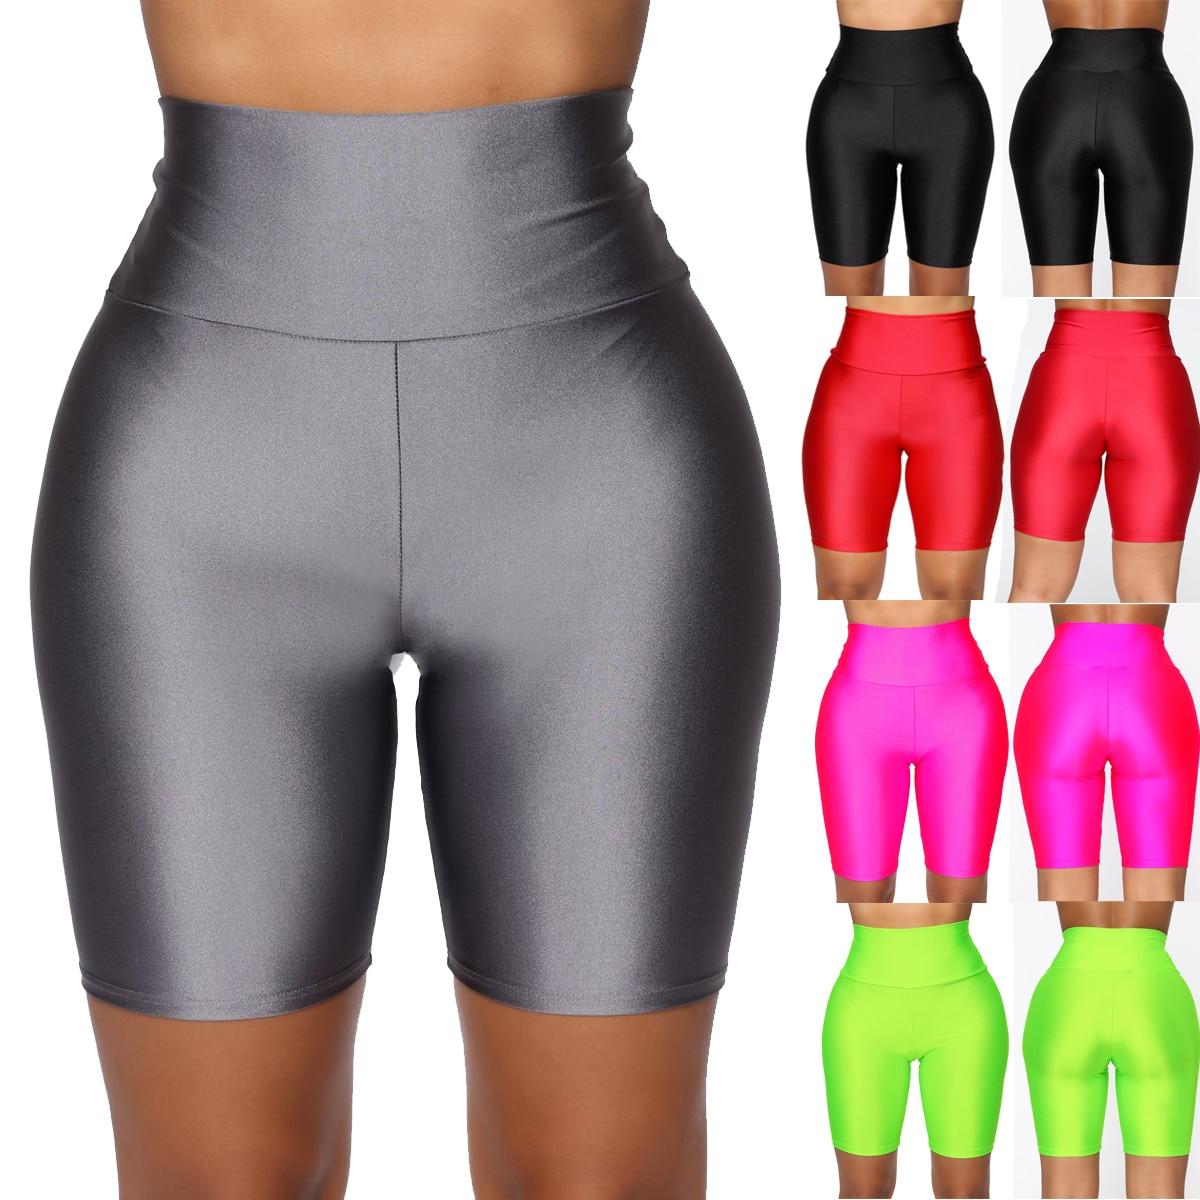 2020 High Waist Neon Yoga Shorts Women Workout Fitness Hip Training Elastic Spandex Shorts Skinny Running Cycling Sportwear